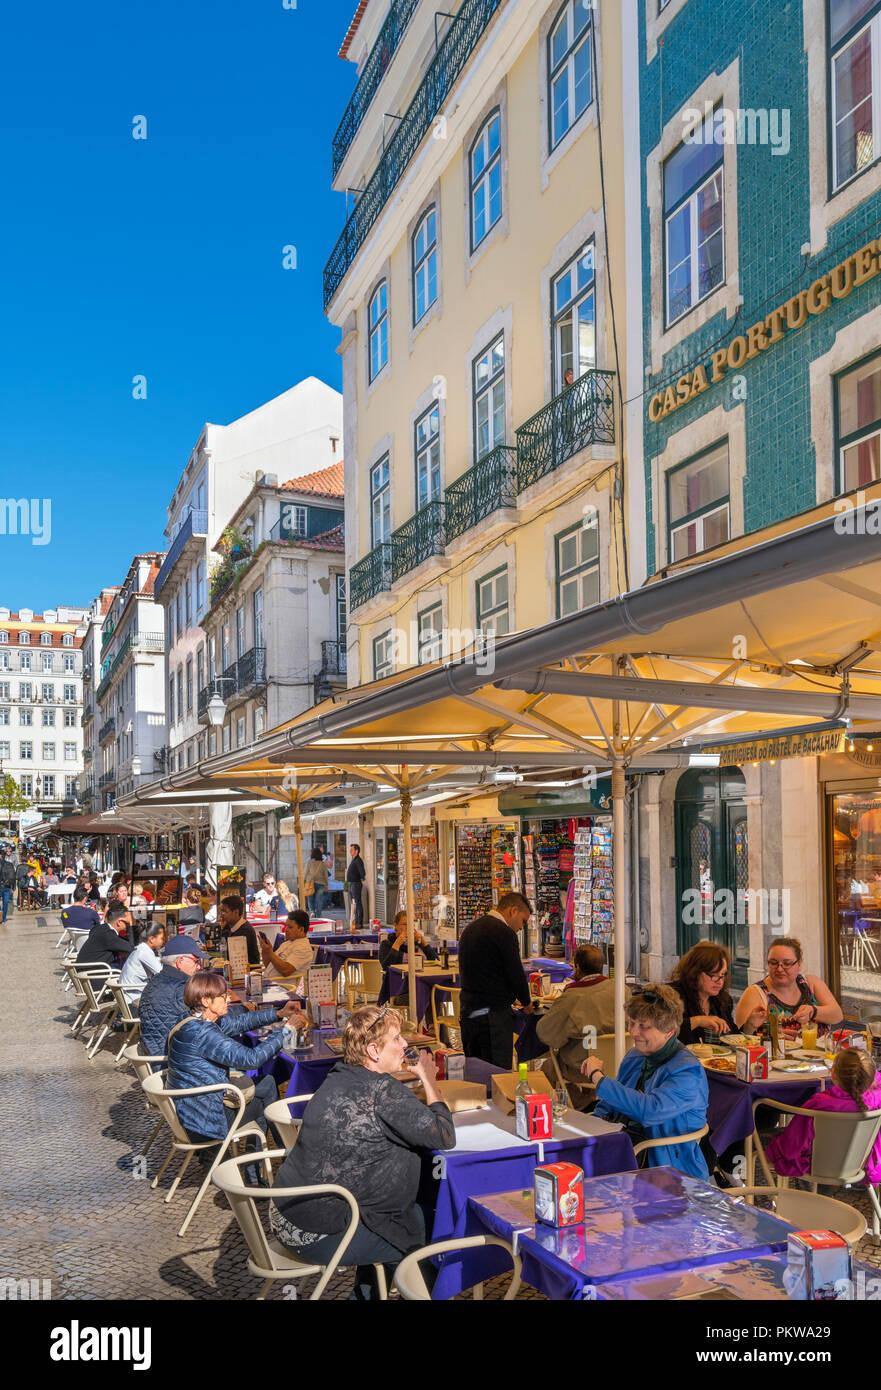 Cafes, bars, restaurants and shops on Rua da Augusta, Baixa district, Lisbon, Portugal - Stock Image